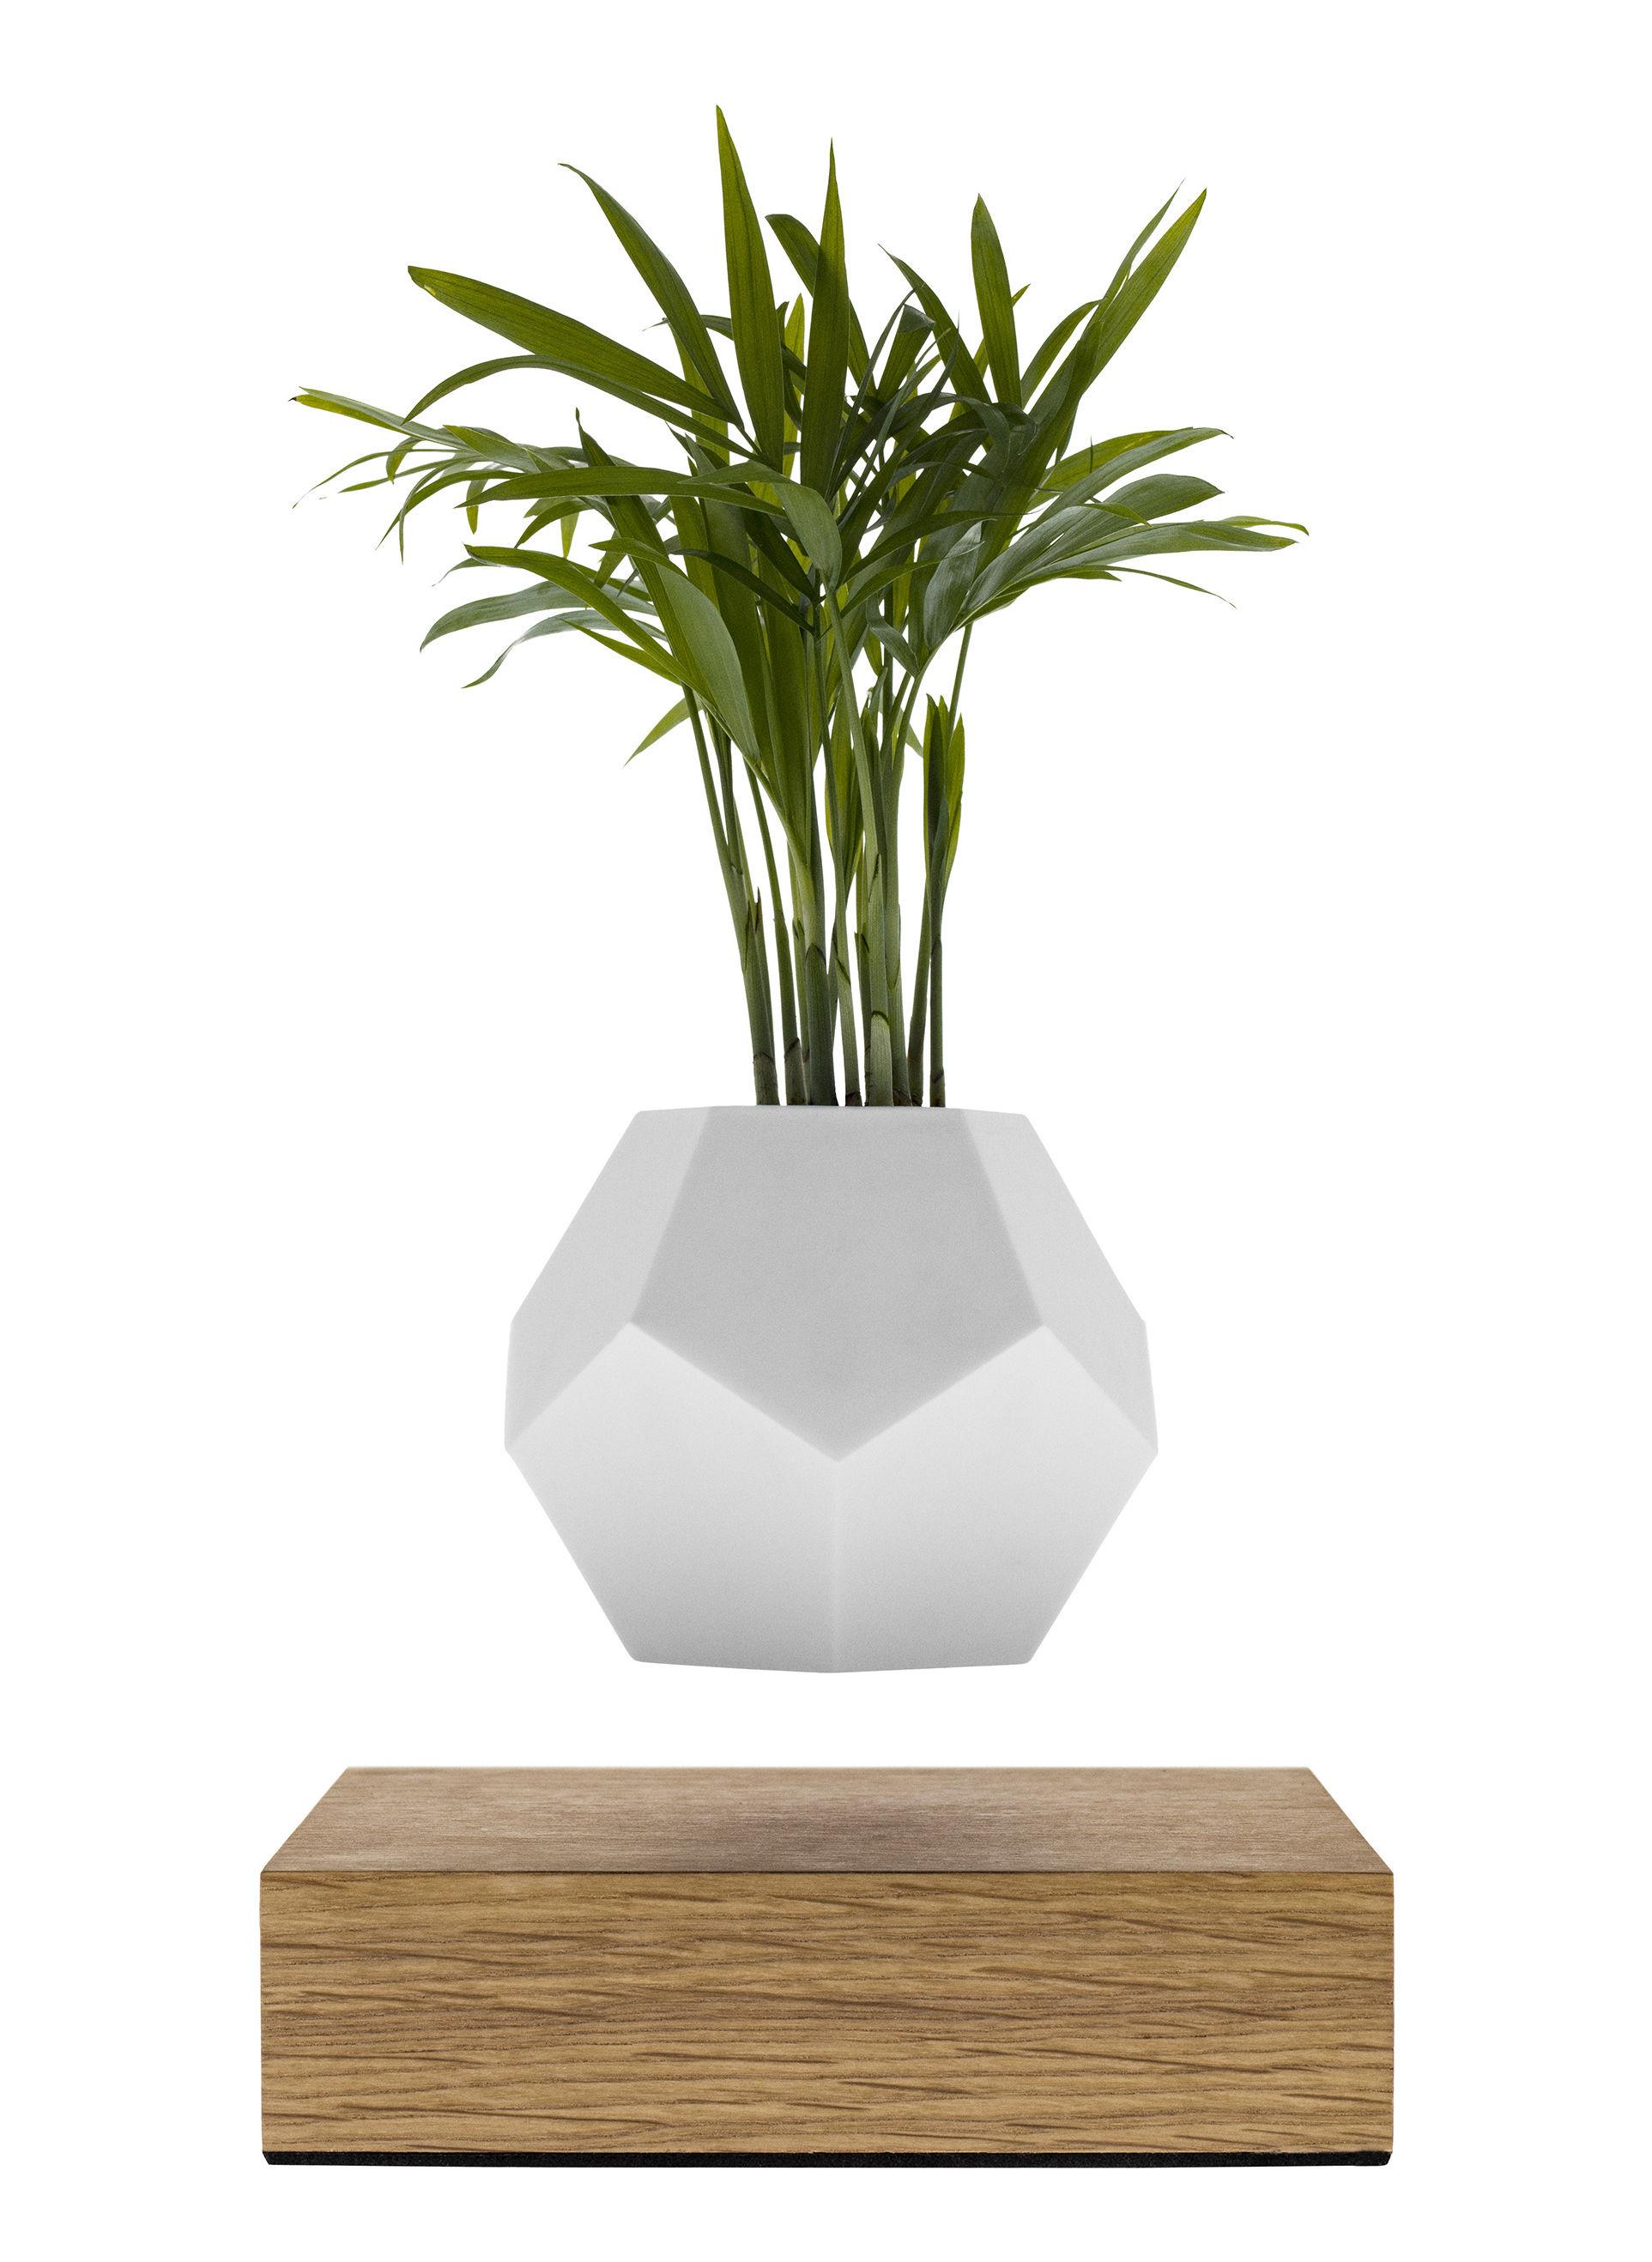 Déco - Pots et plantes - Pot de fleurs Lyfe / Pot en lévitation - Flyte - Blanc / Base chêne - Chêne, Silicone